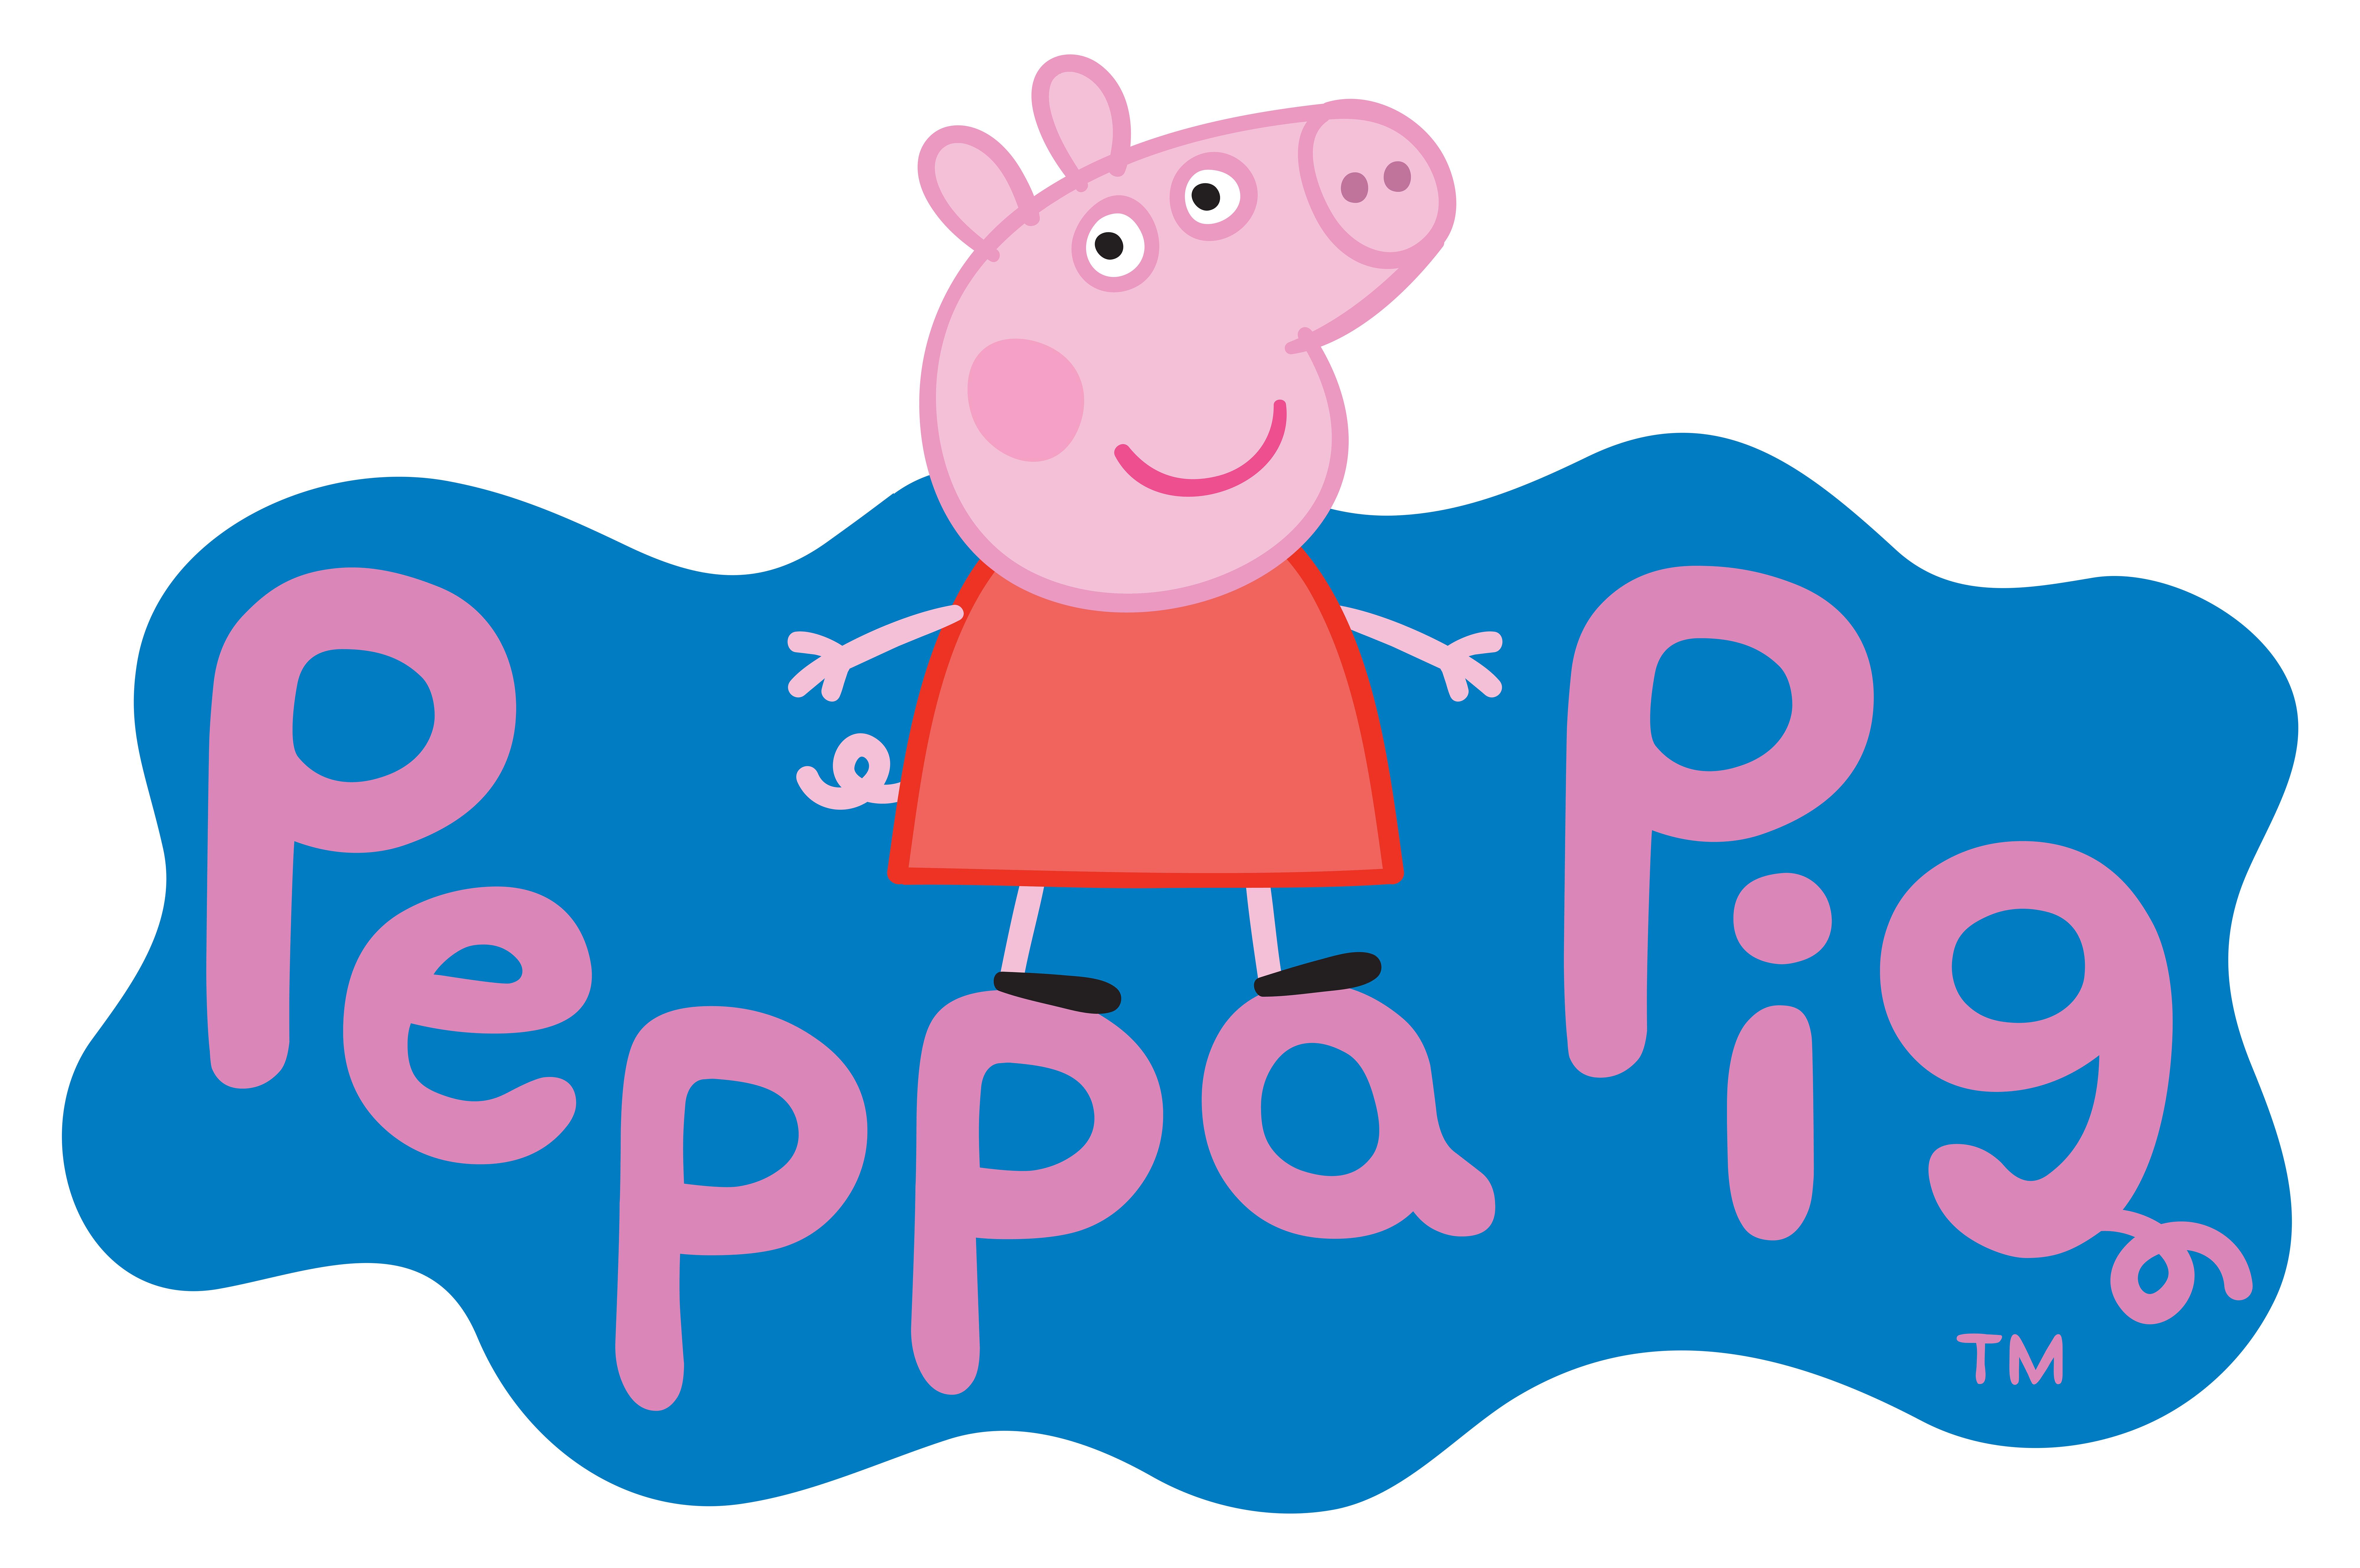 Peppa logo transparent png. Clipart pig beach